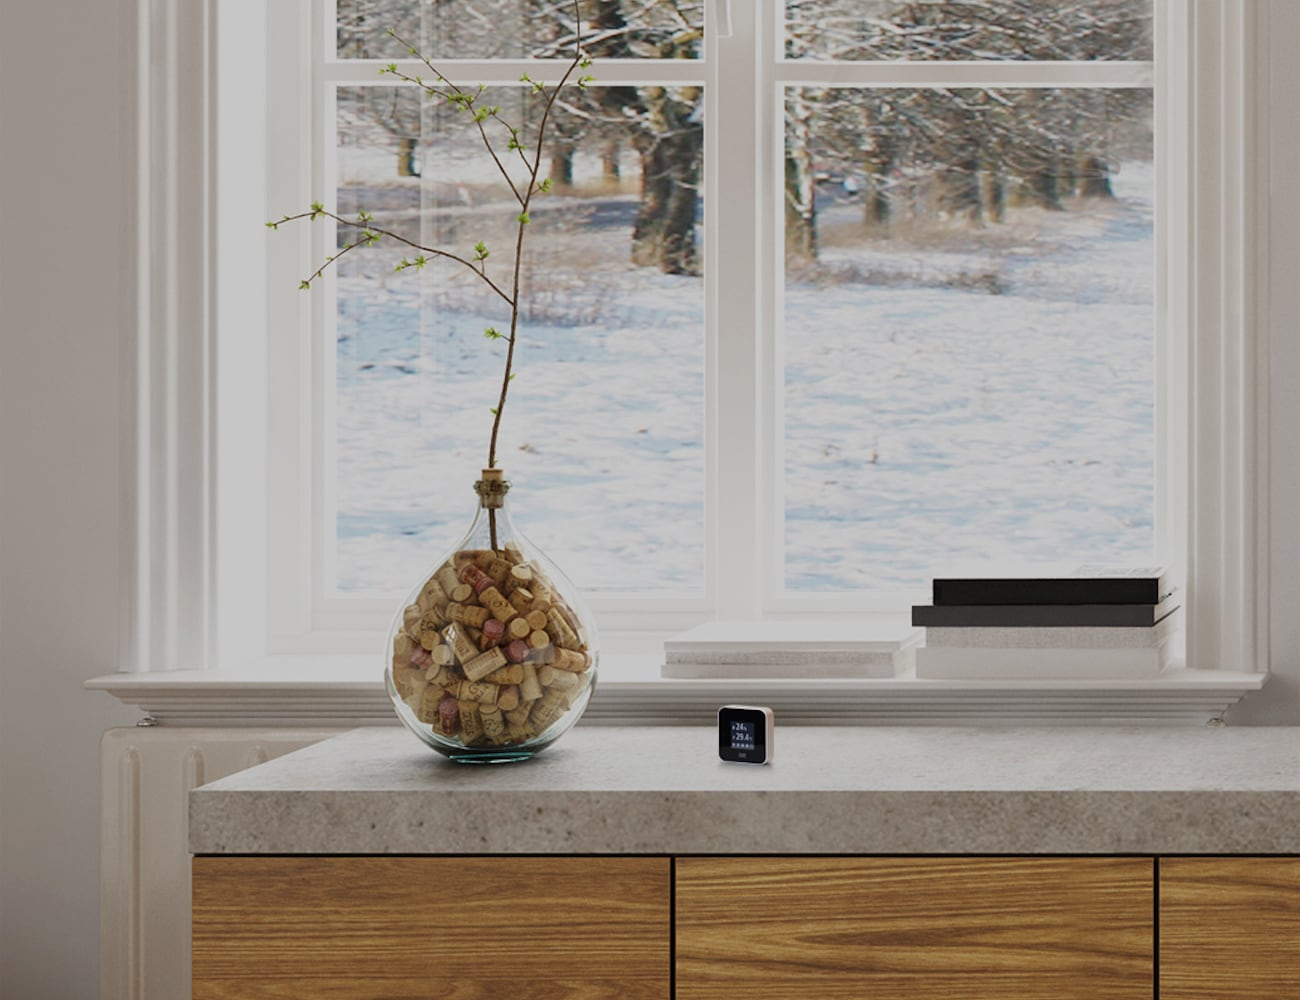 New Eve Room Smart Home Sensor by Elgato